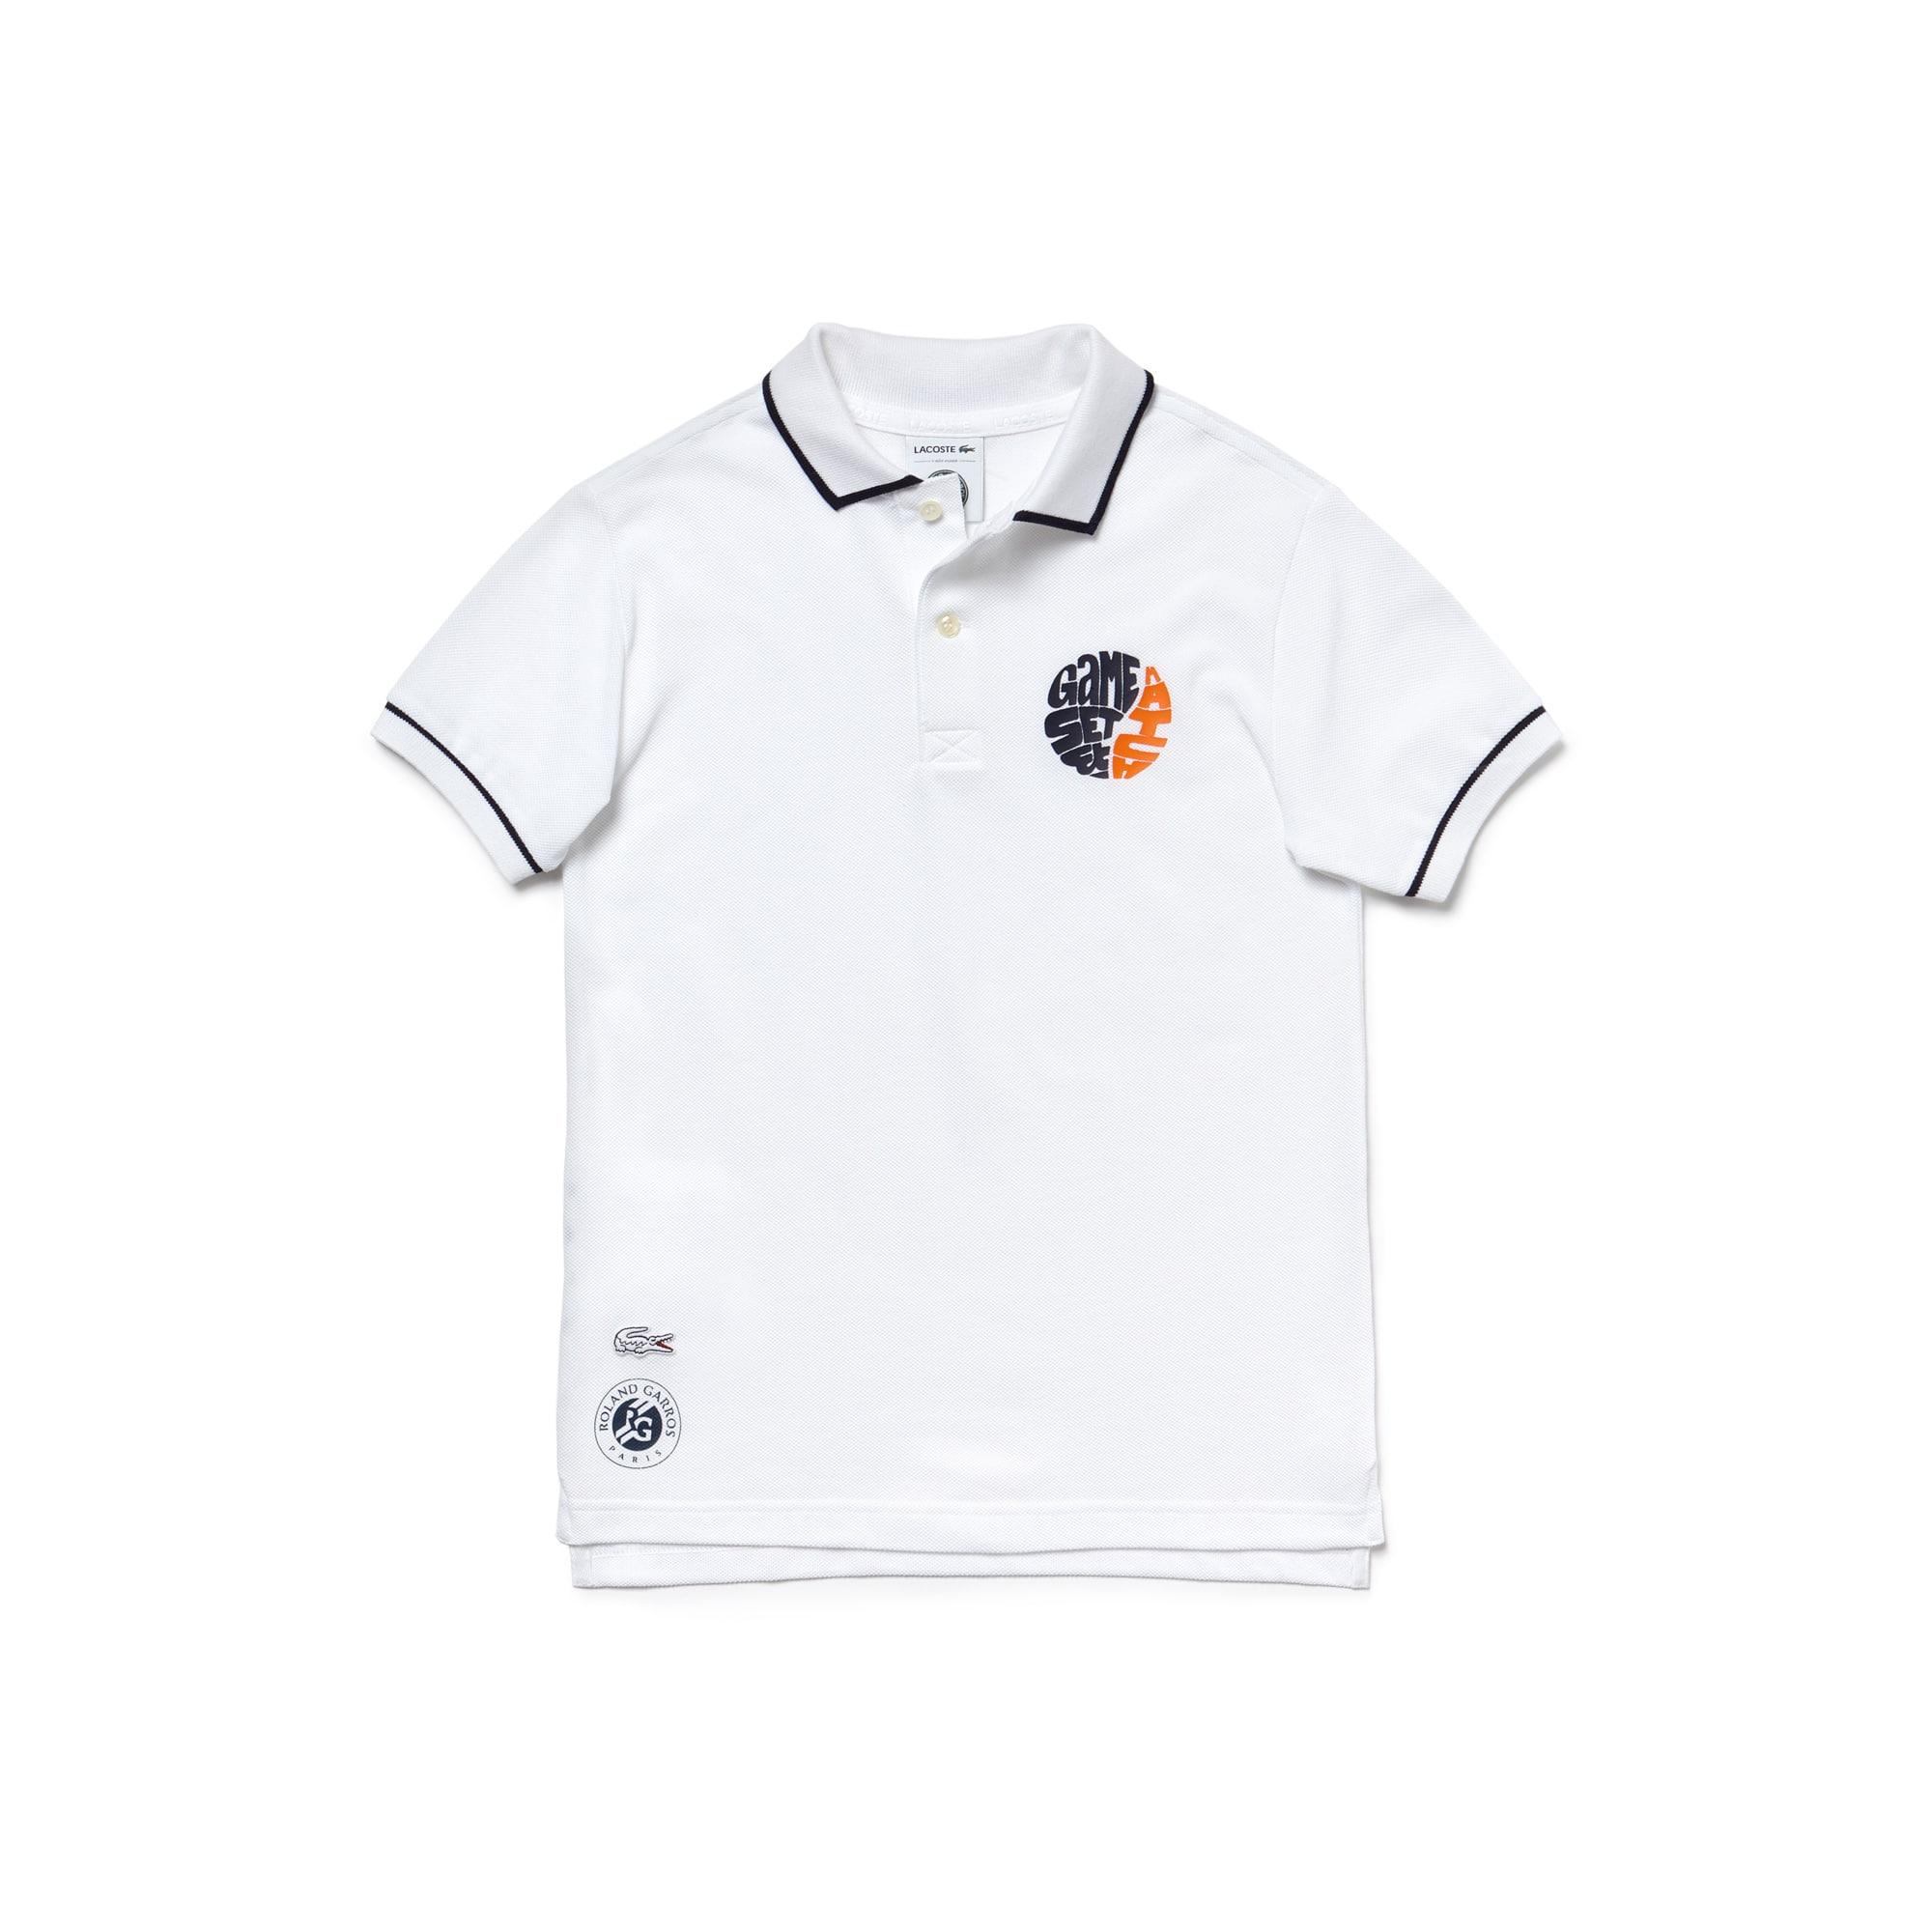 Boys' Lacoste SPORT Roland Garros Edition Petit Piqué Polo Shirt